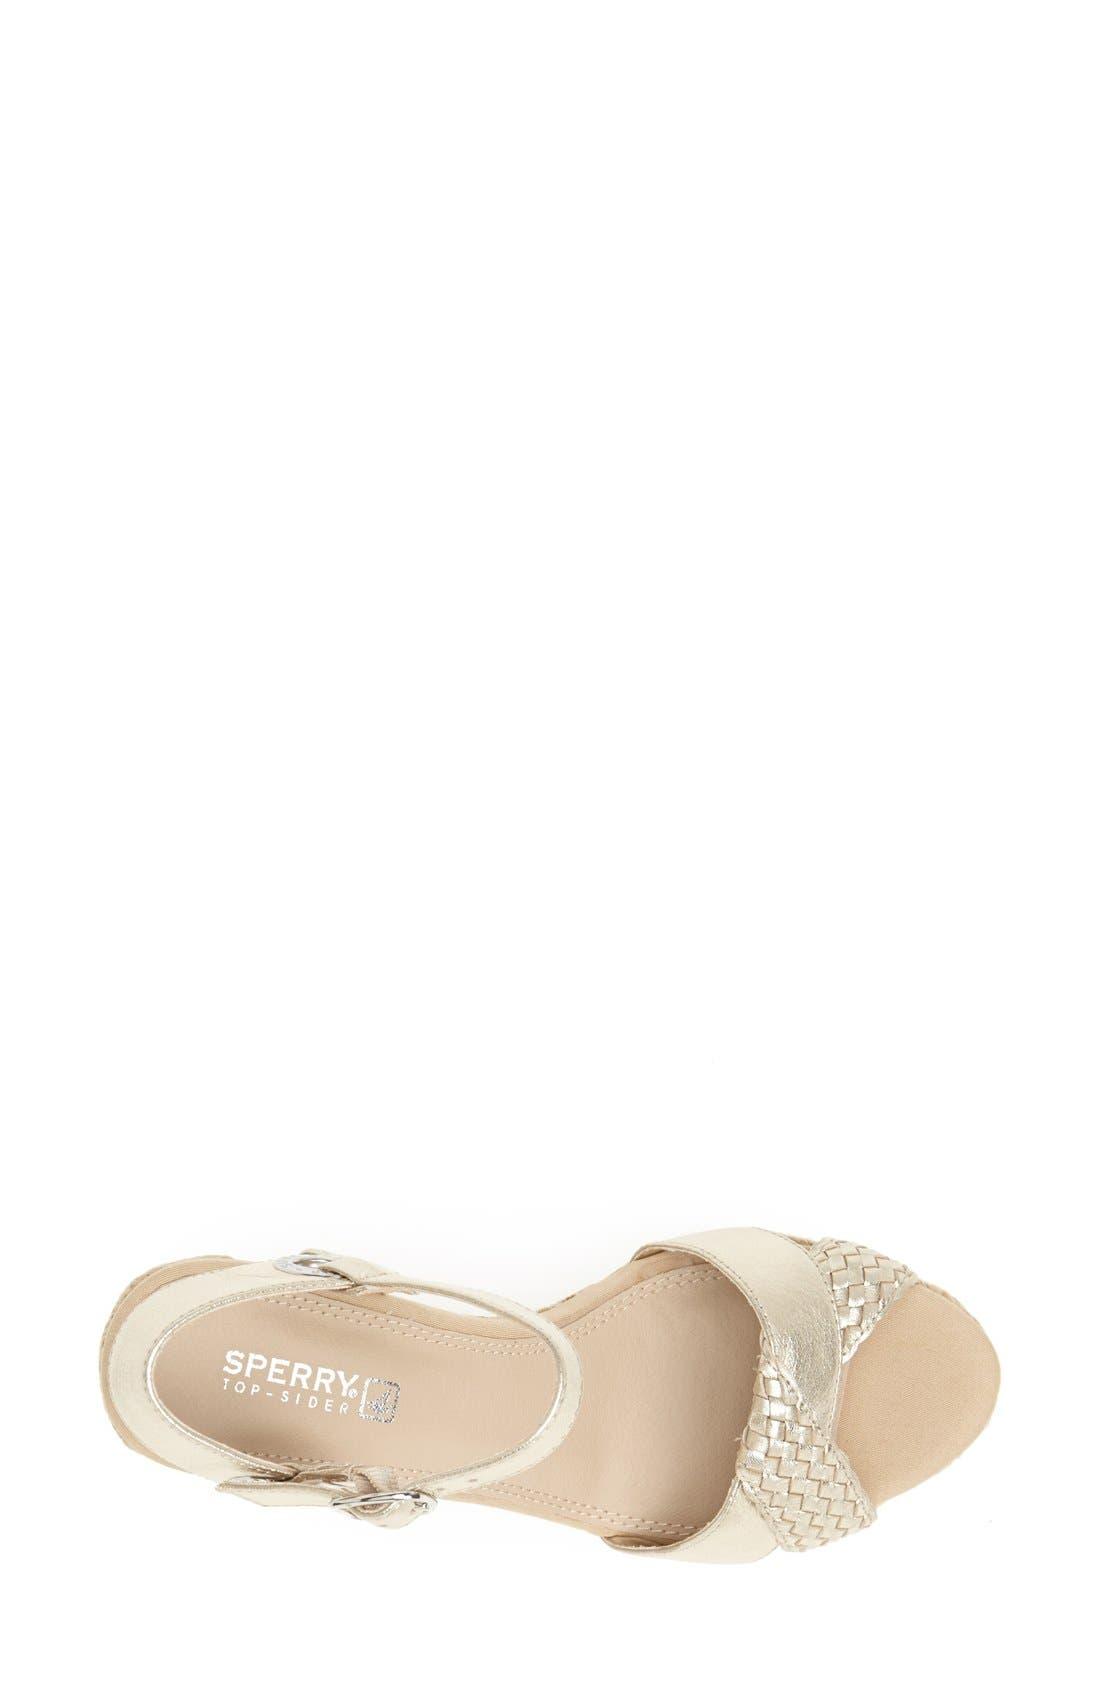 Alternate Image 3  - Sperry Top-Sider® 'Saylor' Wedge Sandal (Women)